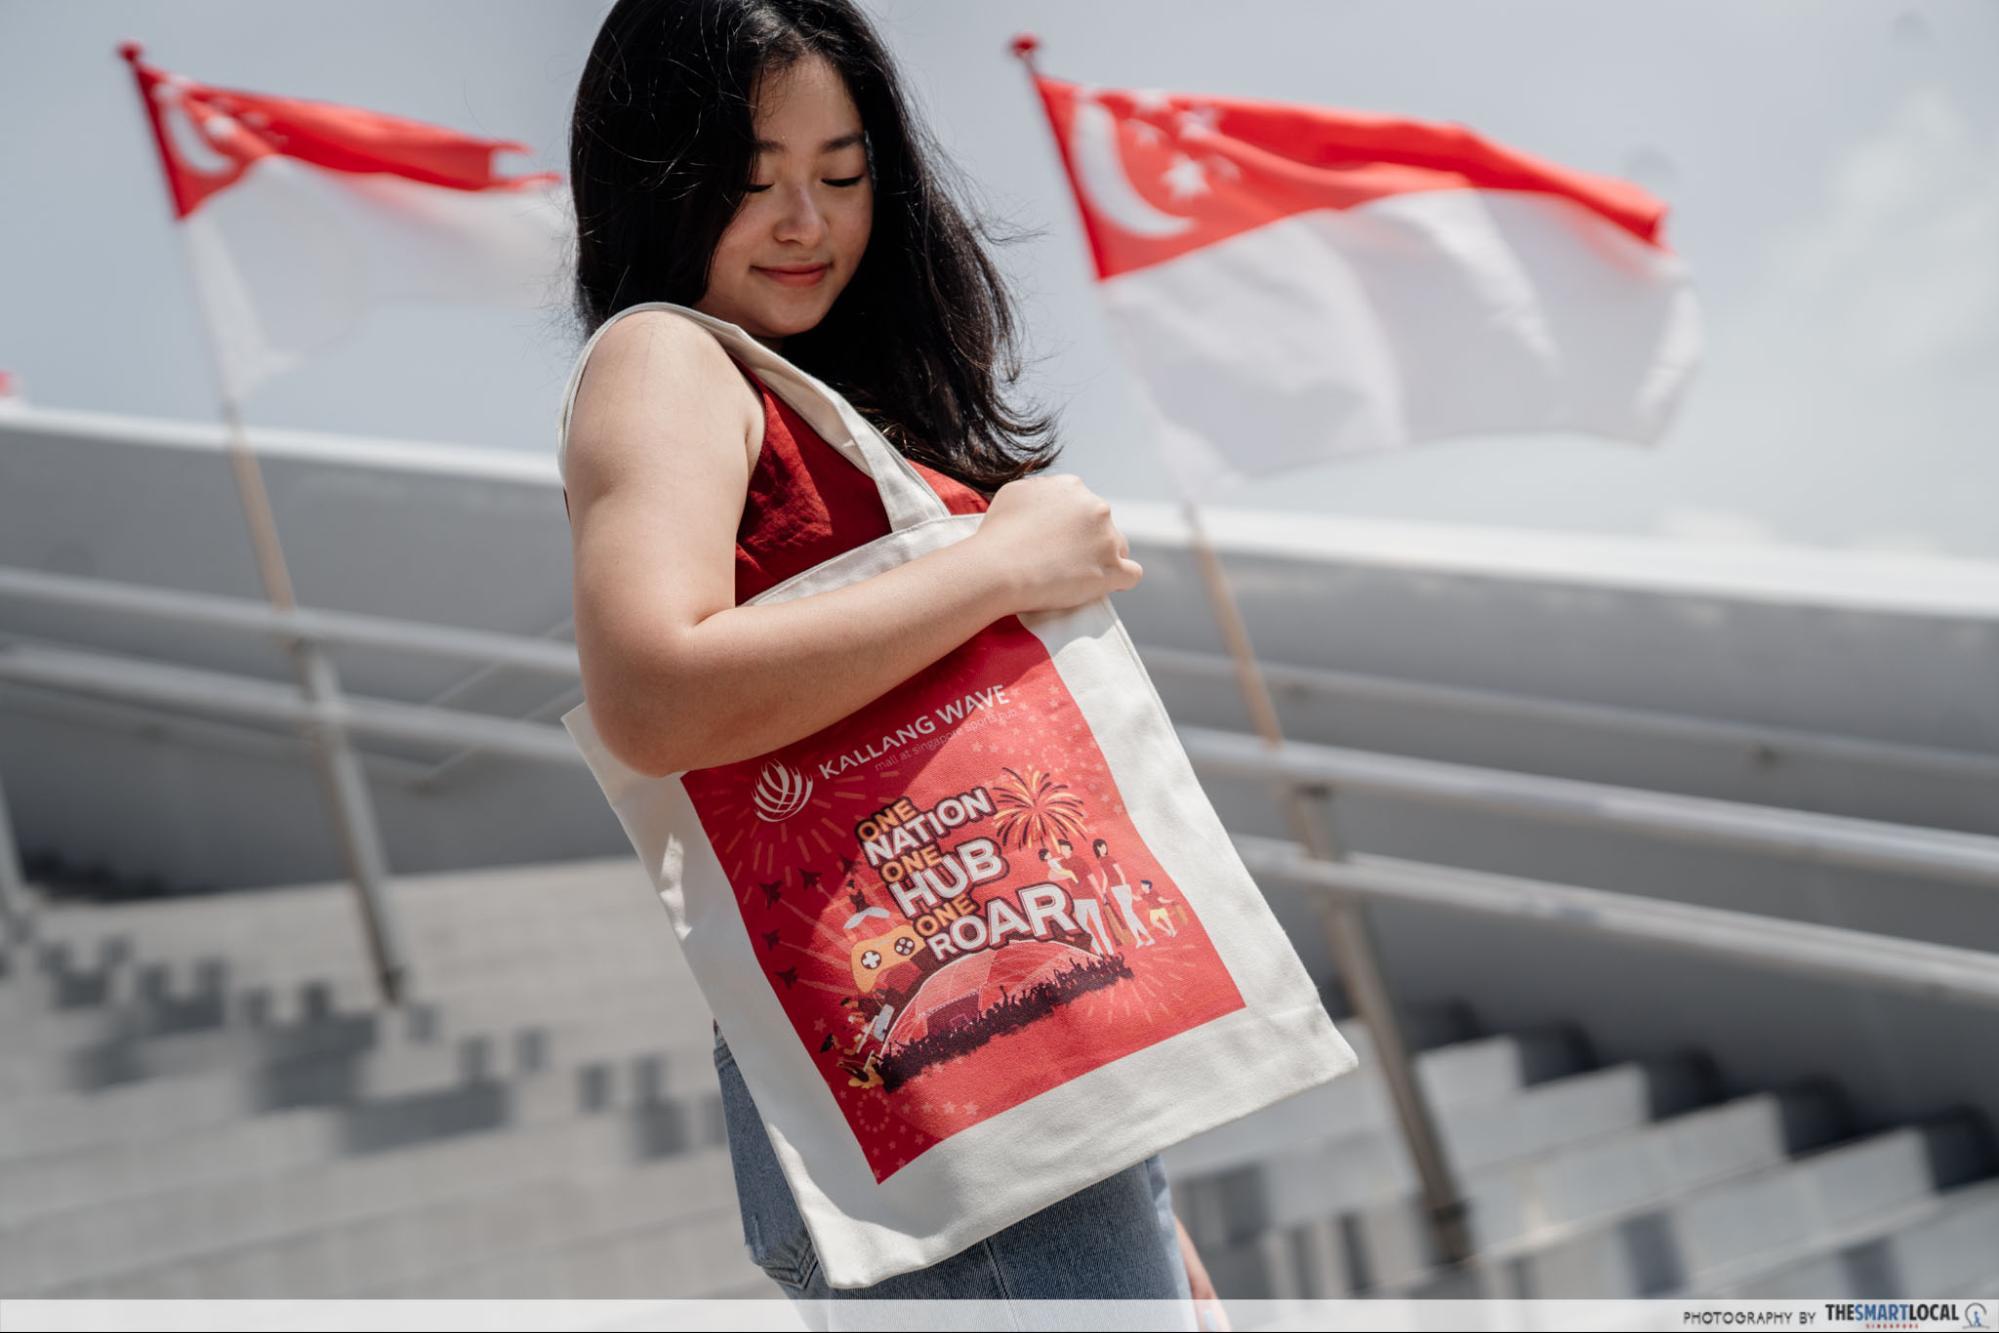 kallang wave mall National Day goodie bag